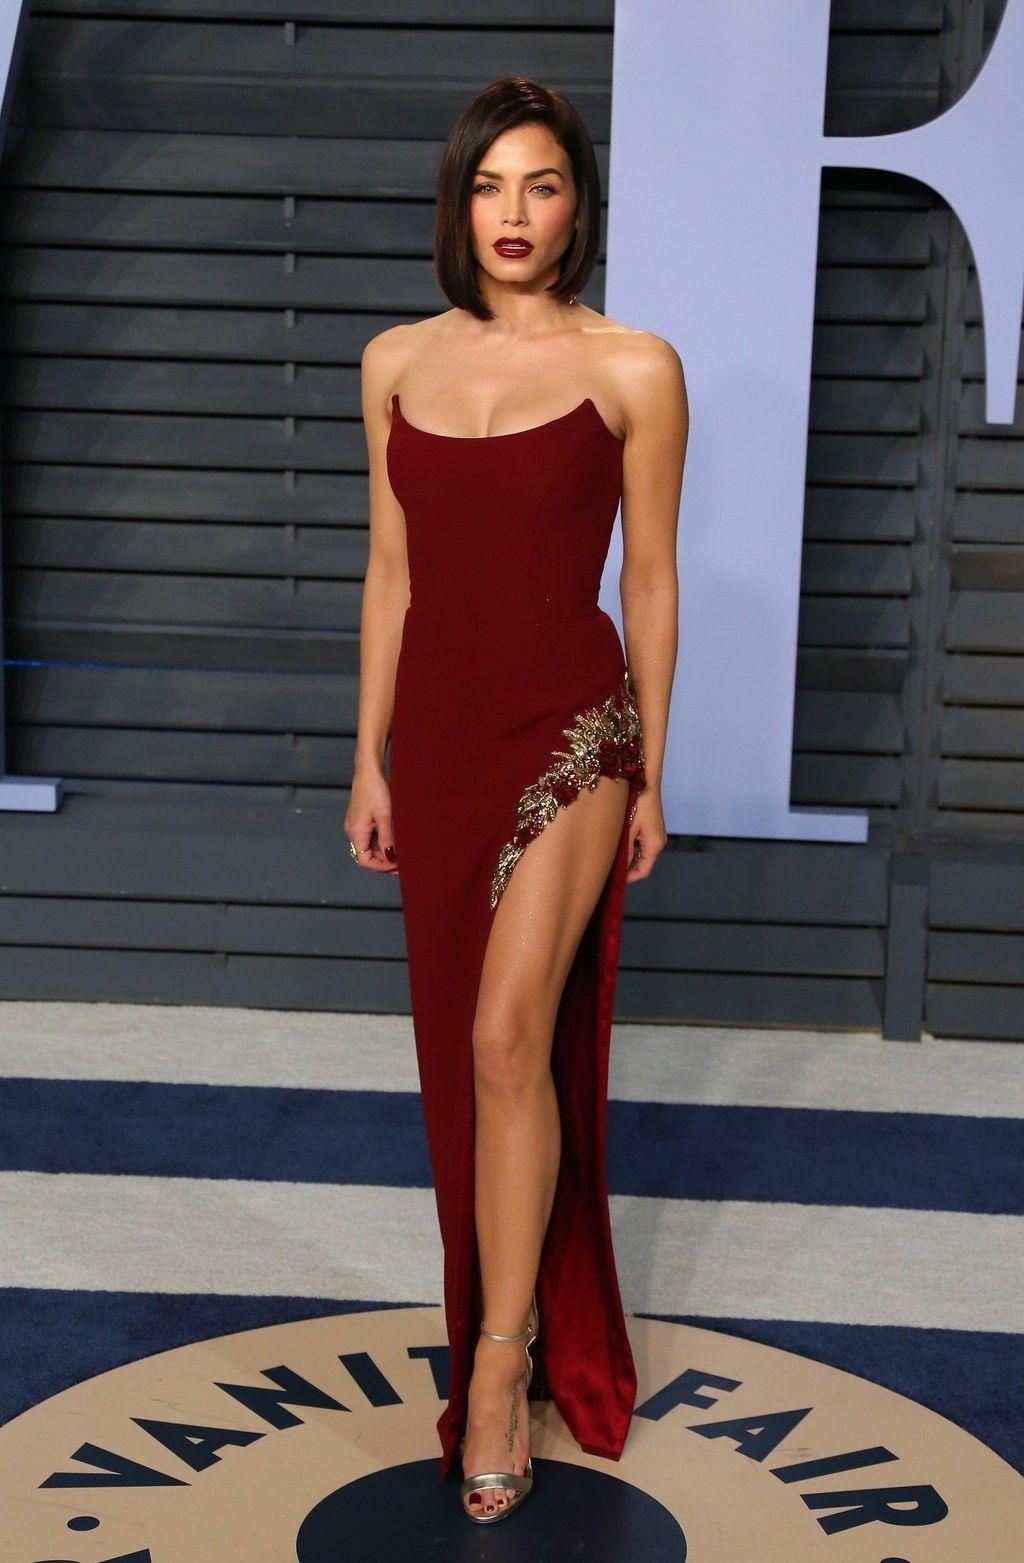 015dff793be0fb Jenna Dewan Tatum wearing Pamella Roland to the 'Vanity Fair' Oscars  after-party.